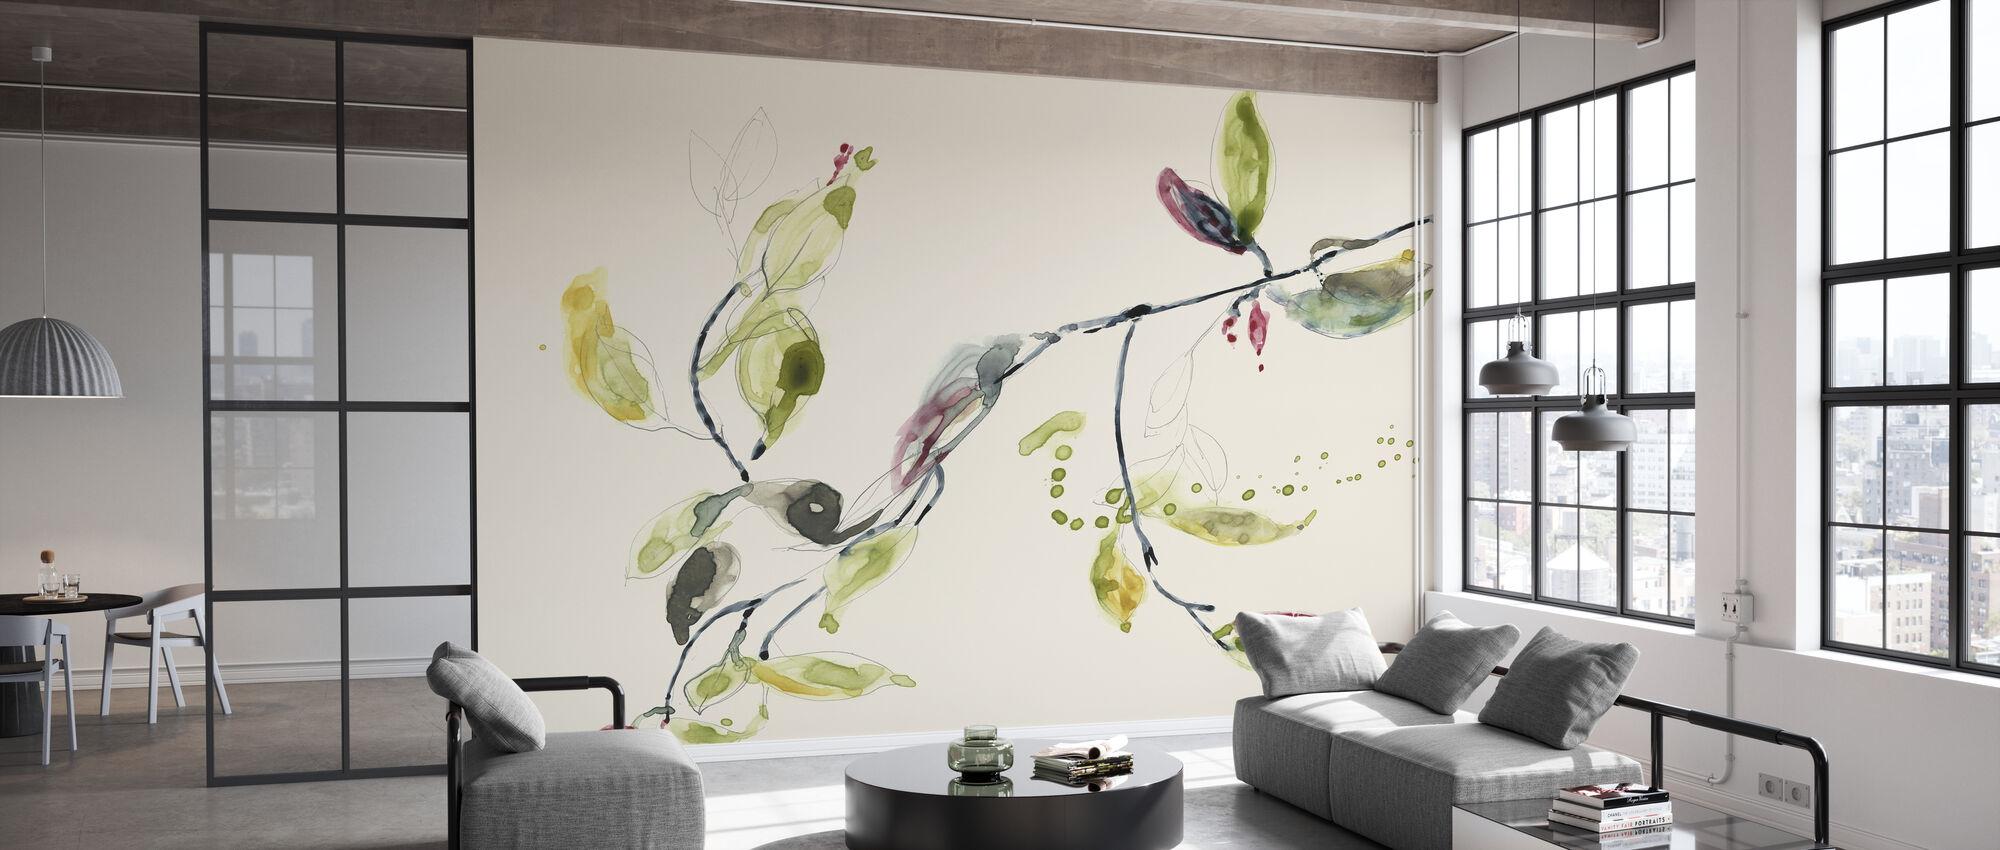 Leaf Branch - Wallpaper - Office